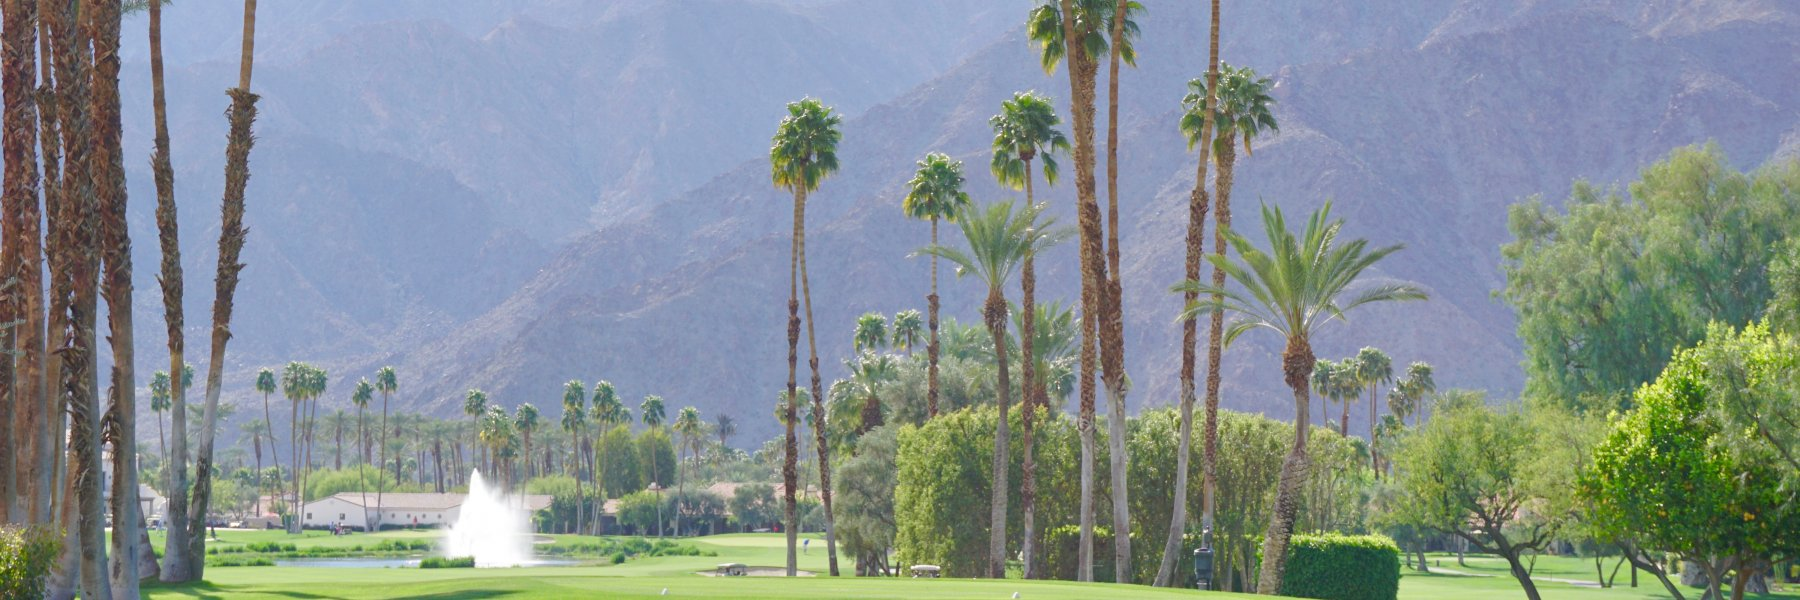 La Quinta Country Club Golf Estates is a community of homes in La Quinta California